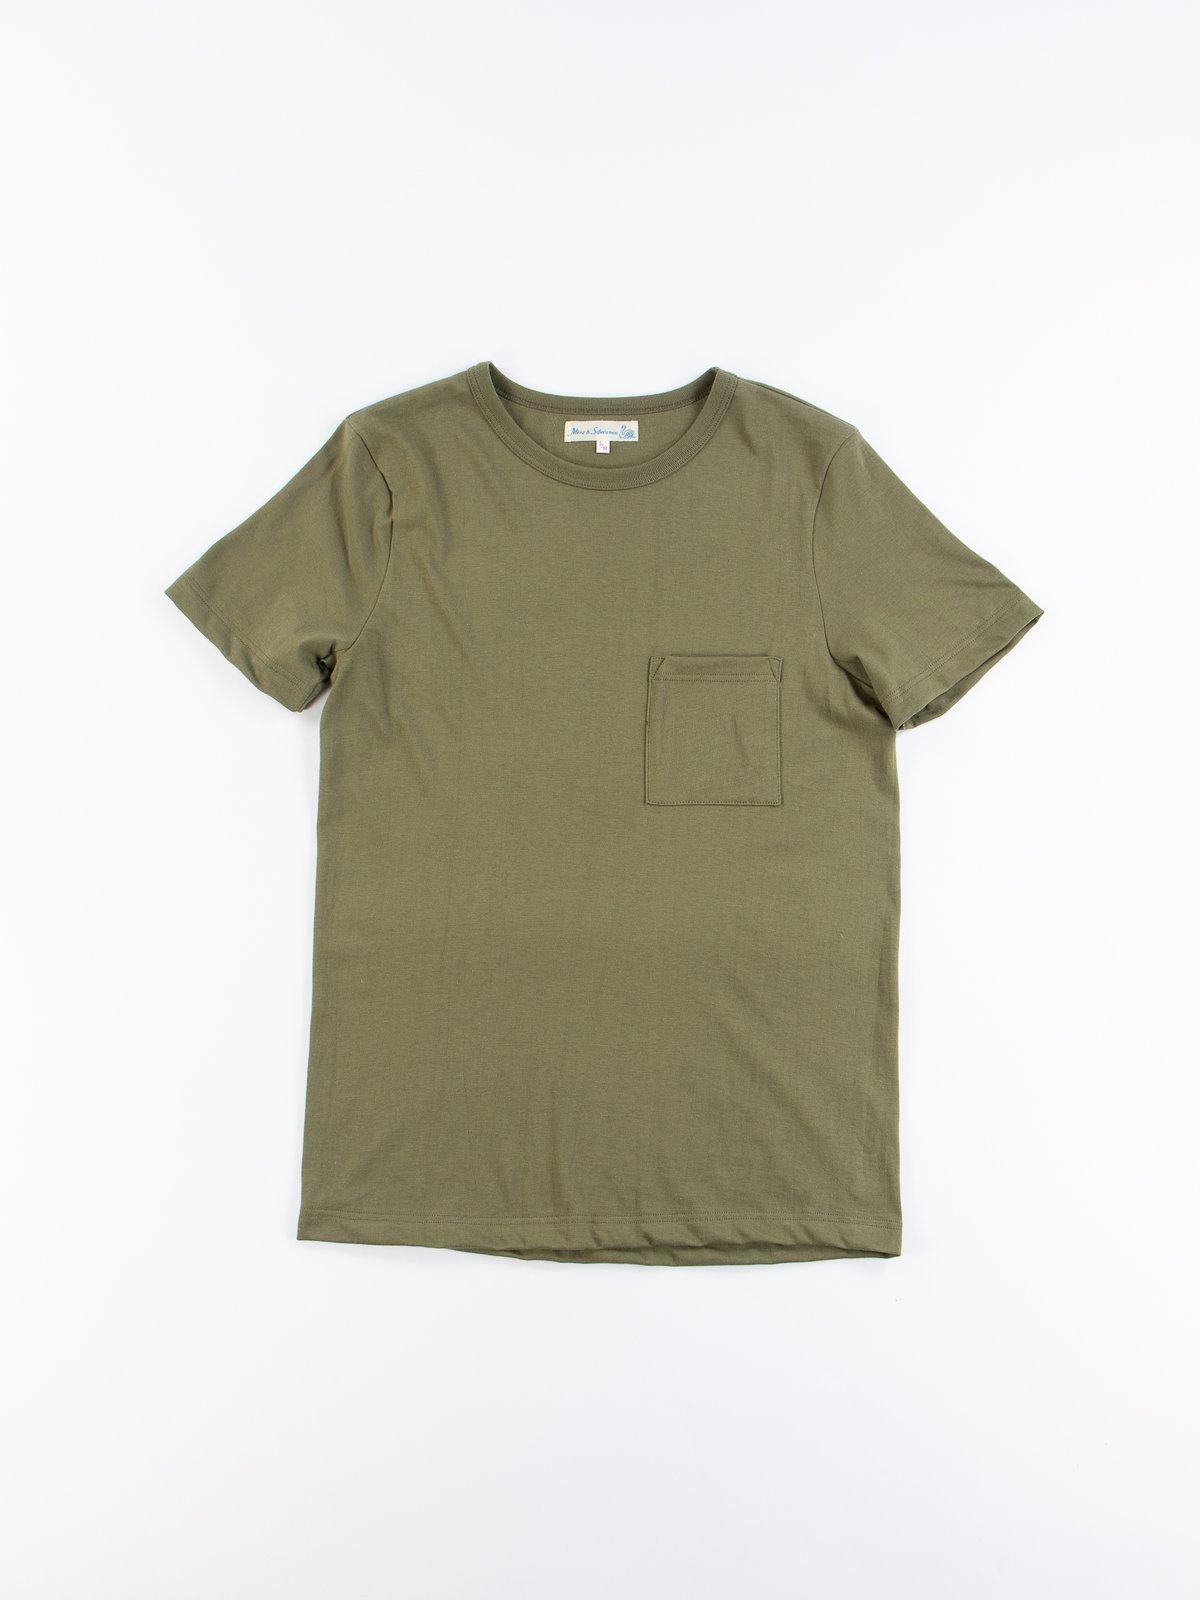 Army 1950s Organic Pocket Tee - Image 1